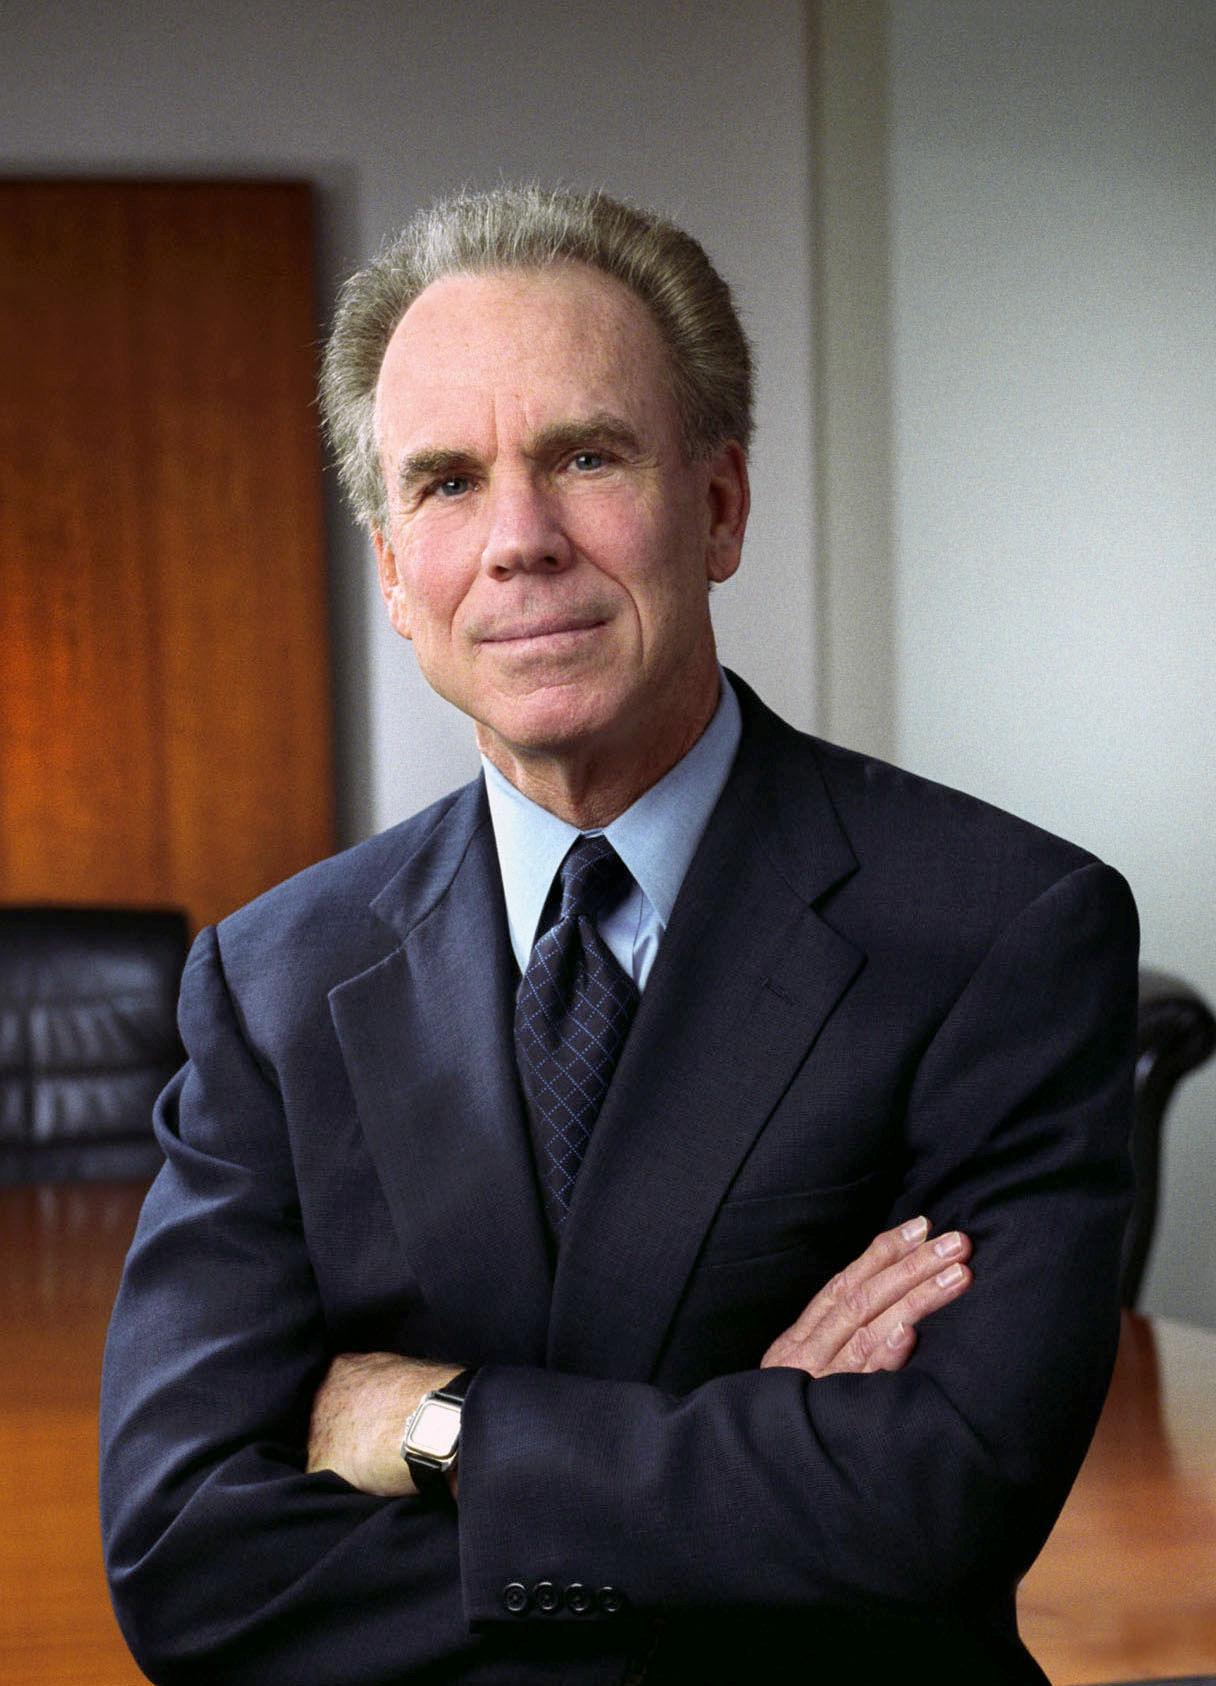 Roger Staubach